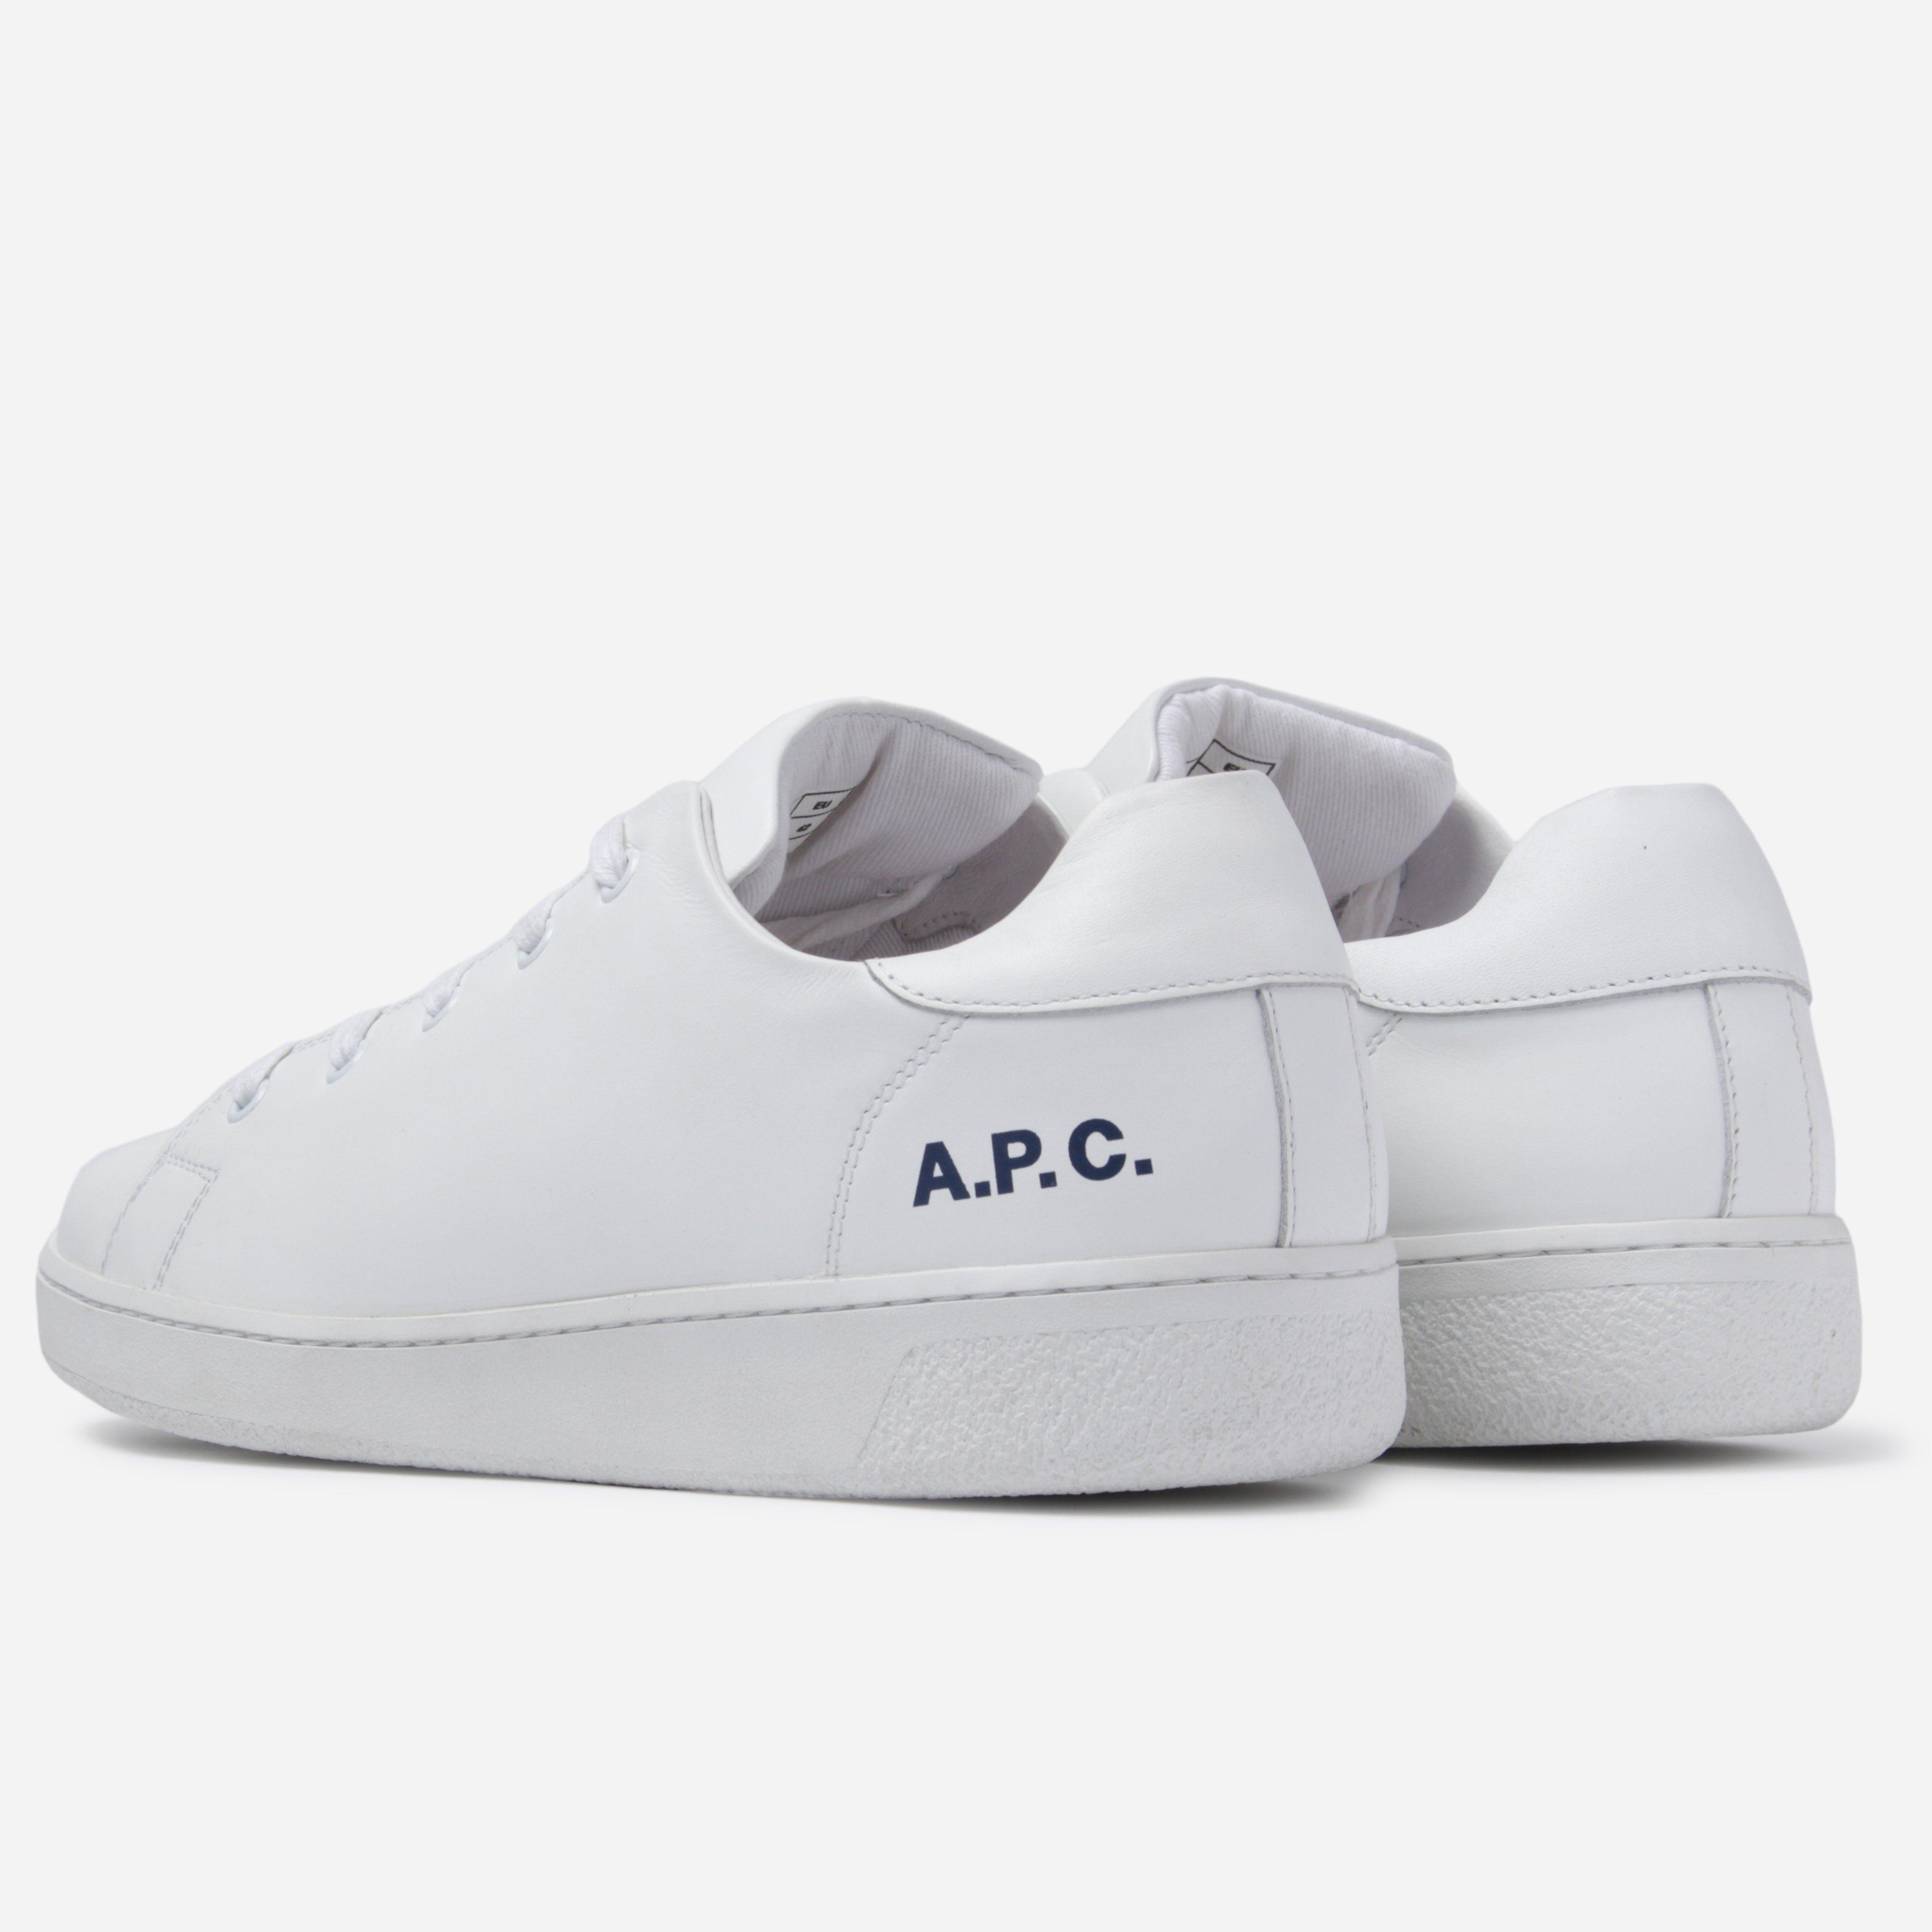 A.P.C. Minimal Homme